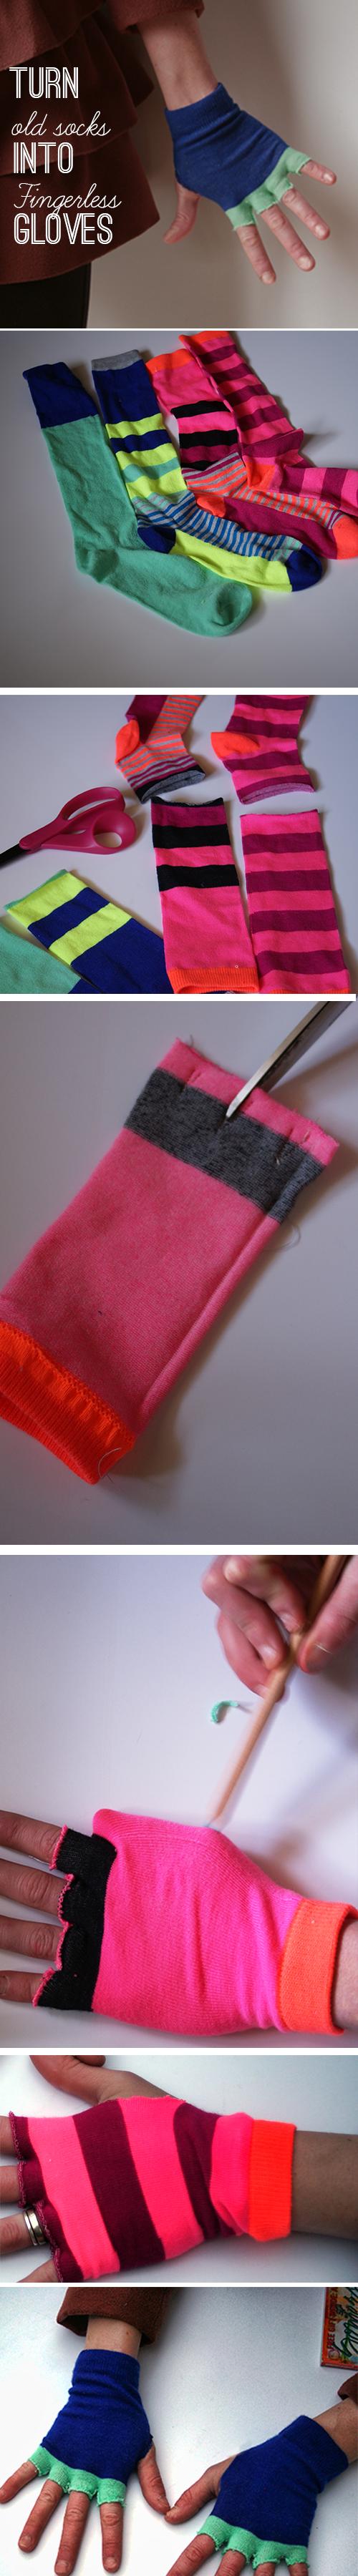 Fingerless gloves diy - Upcycle Old Socks To Fingerless Gloves In This Easy Diy Savedbyloves